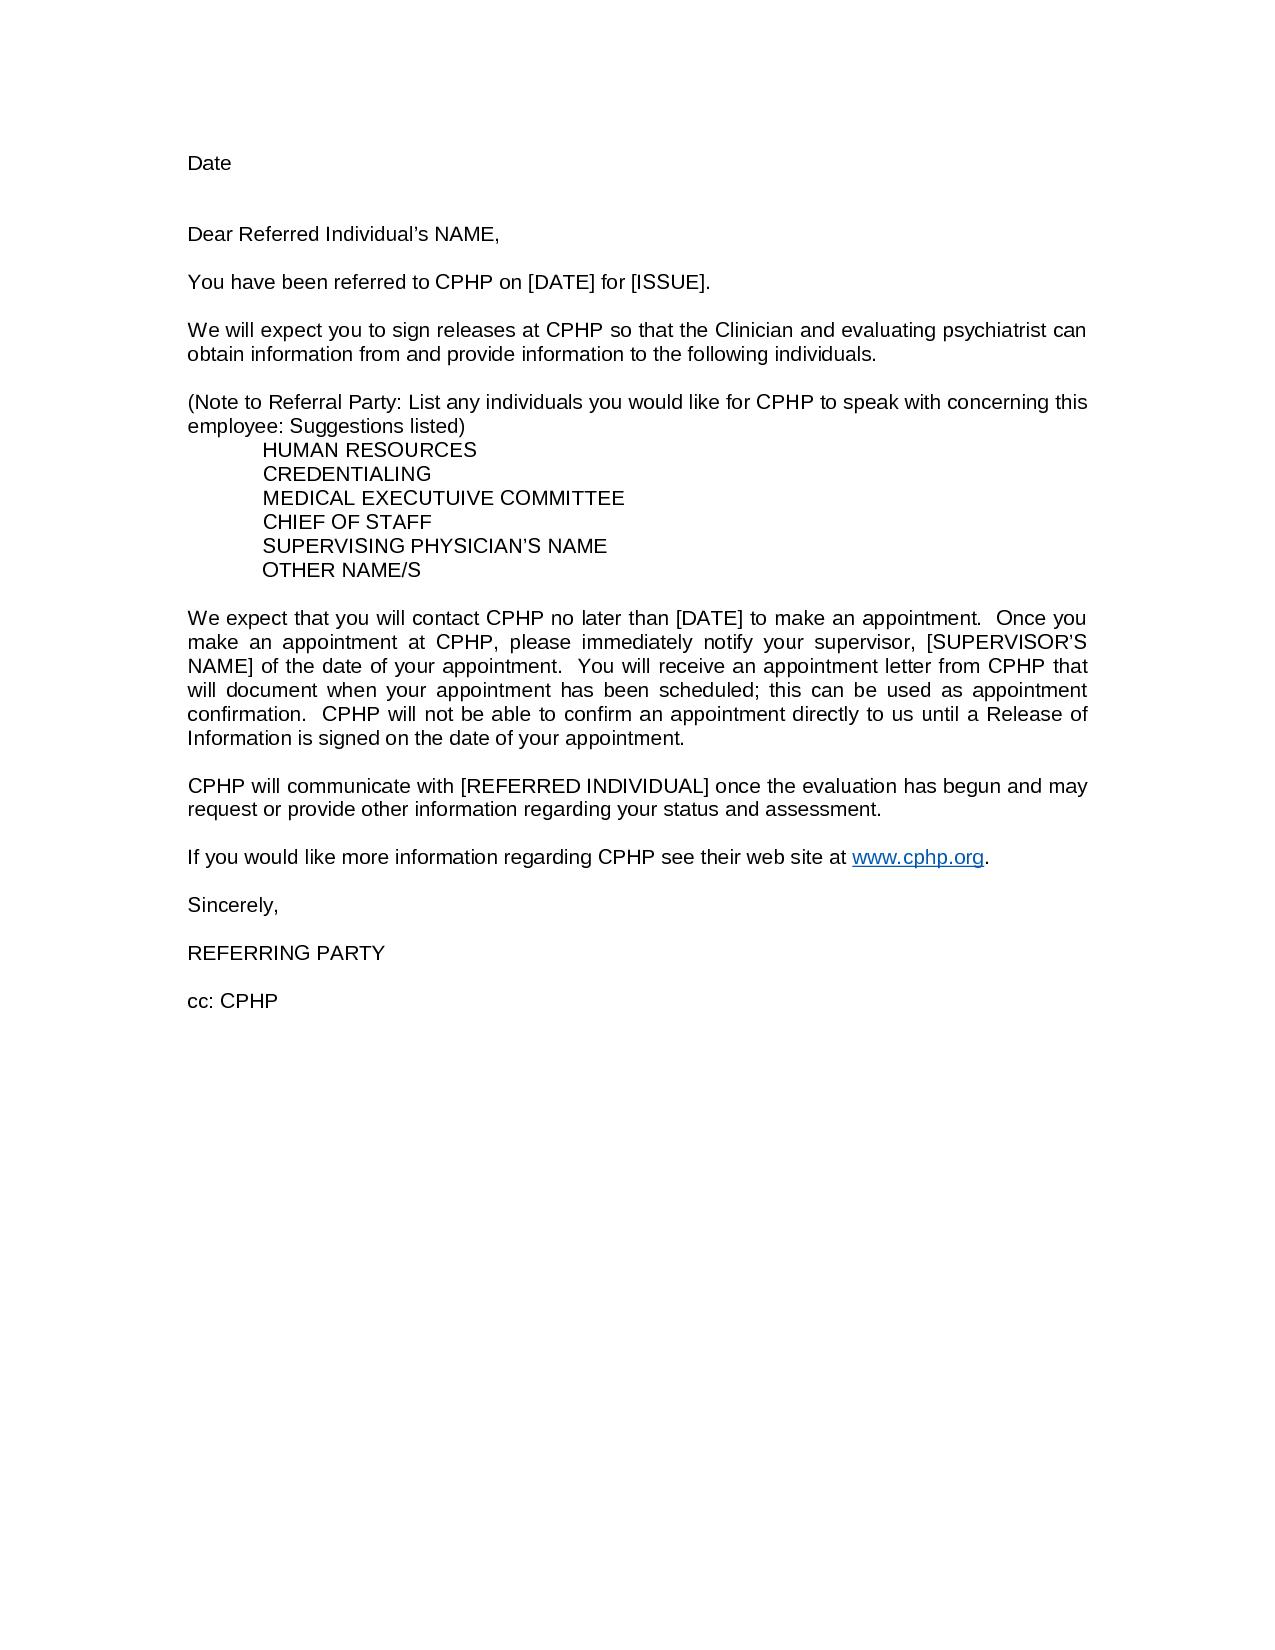 Medical Referral Letter Template - Referring Letter Gallery Letter format formal Sample